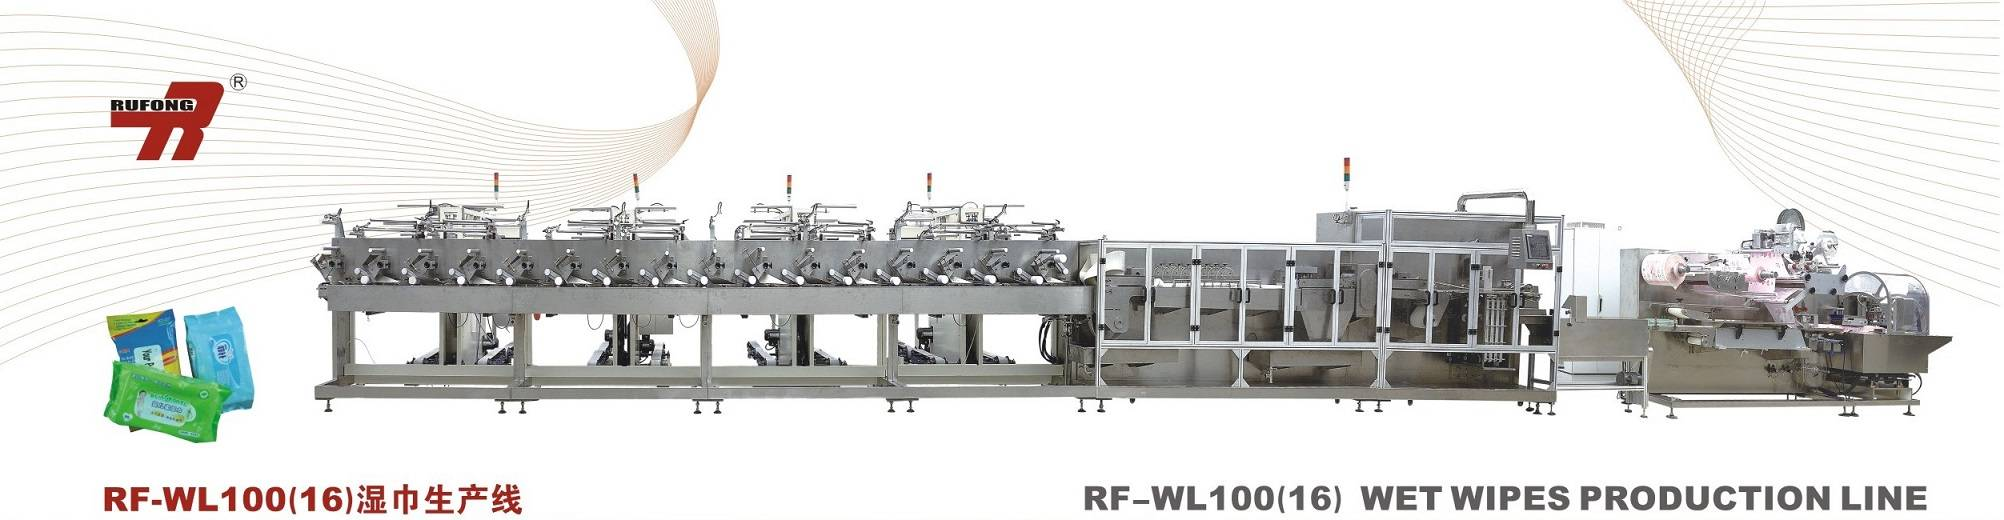 RF-WL100(16) Wet Wipes Production Line